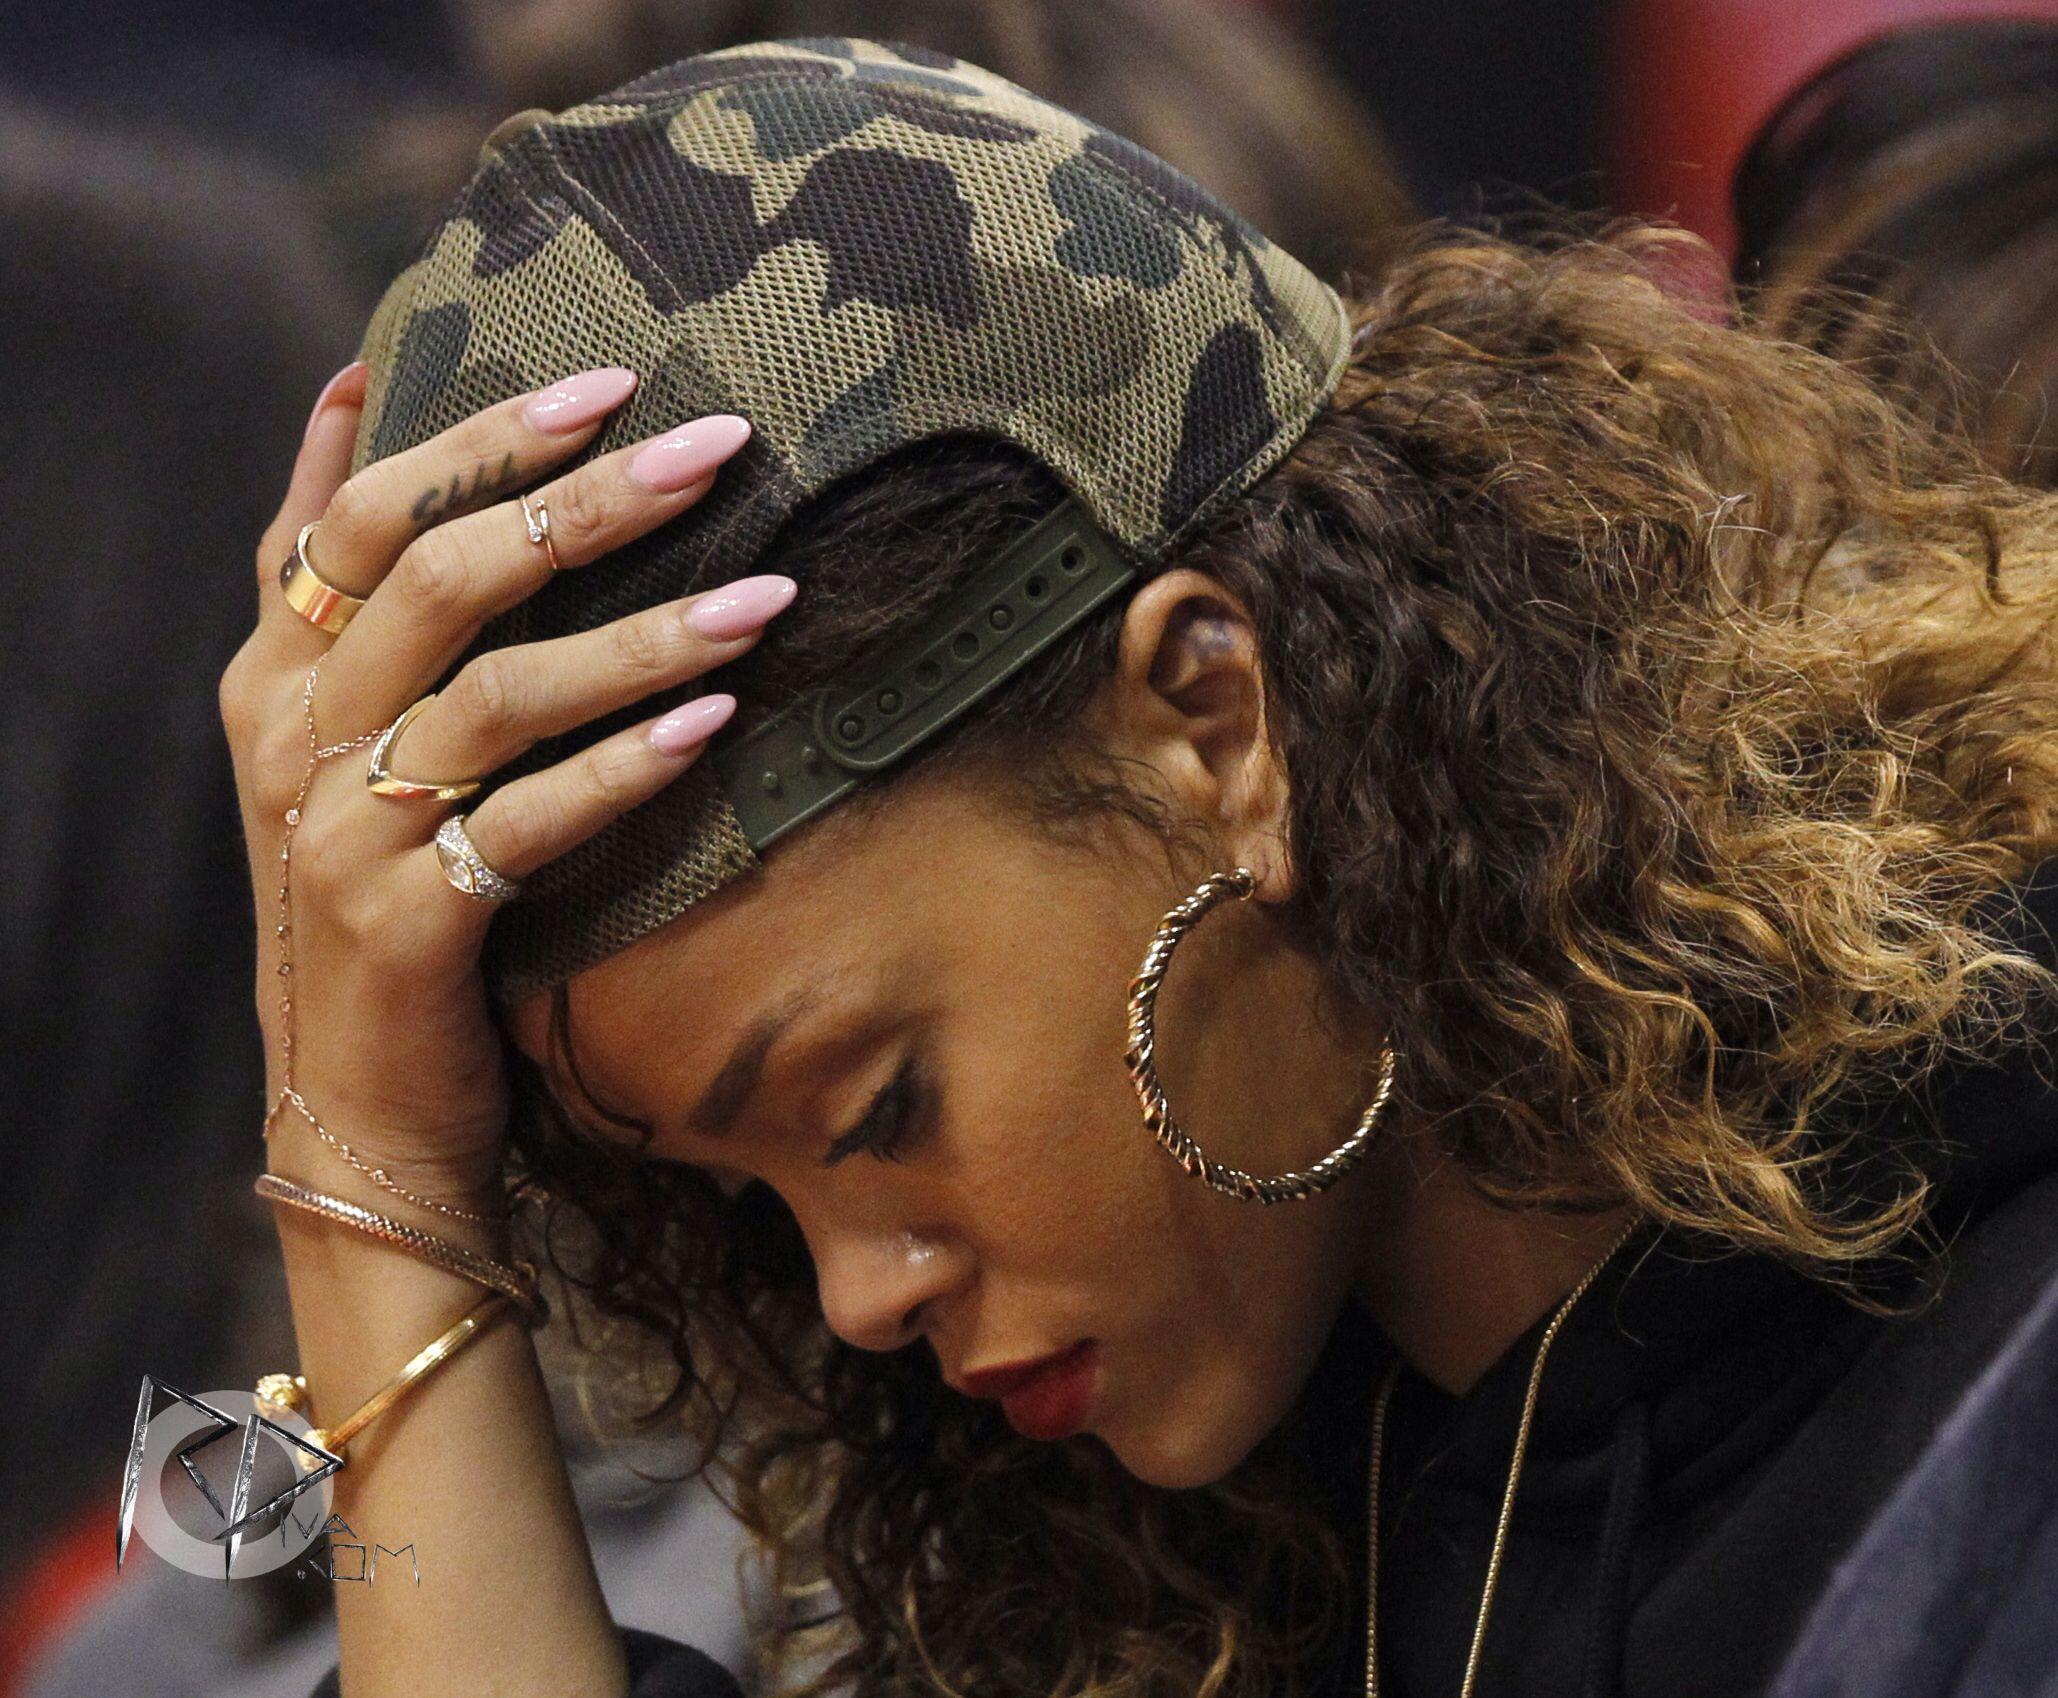 Paul de p Square Dating Rihanna